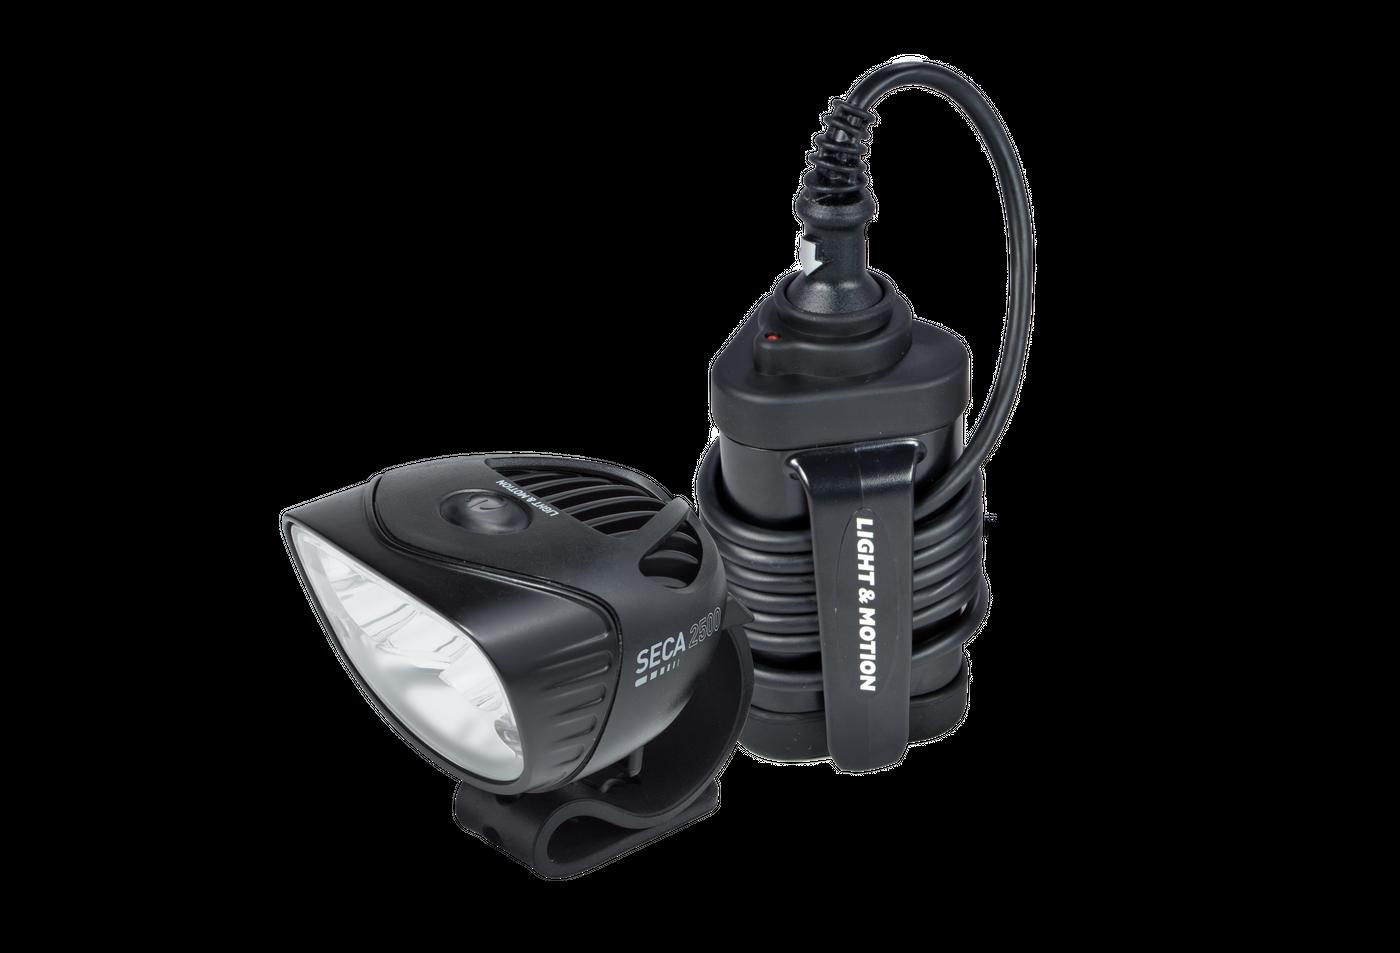 Light-and-Motion-Seca-2500